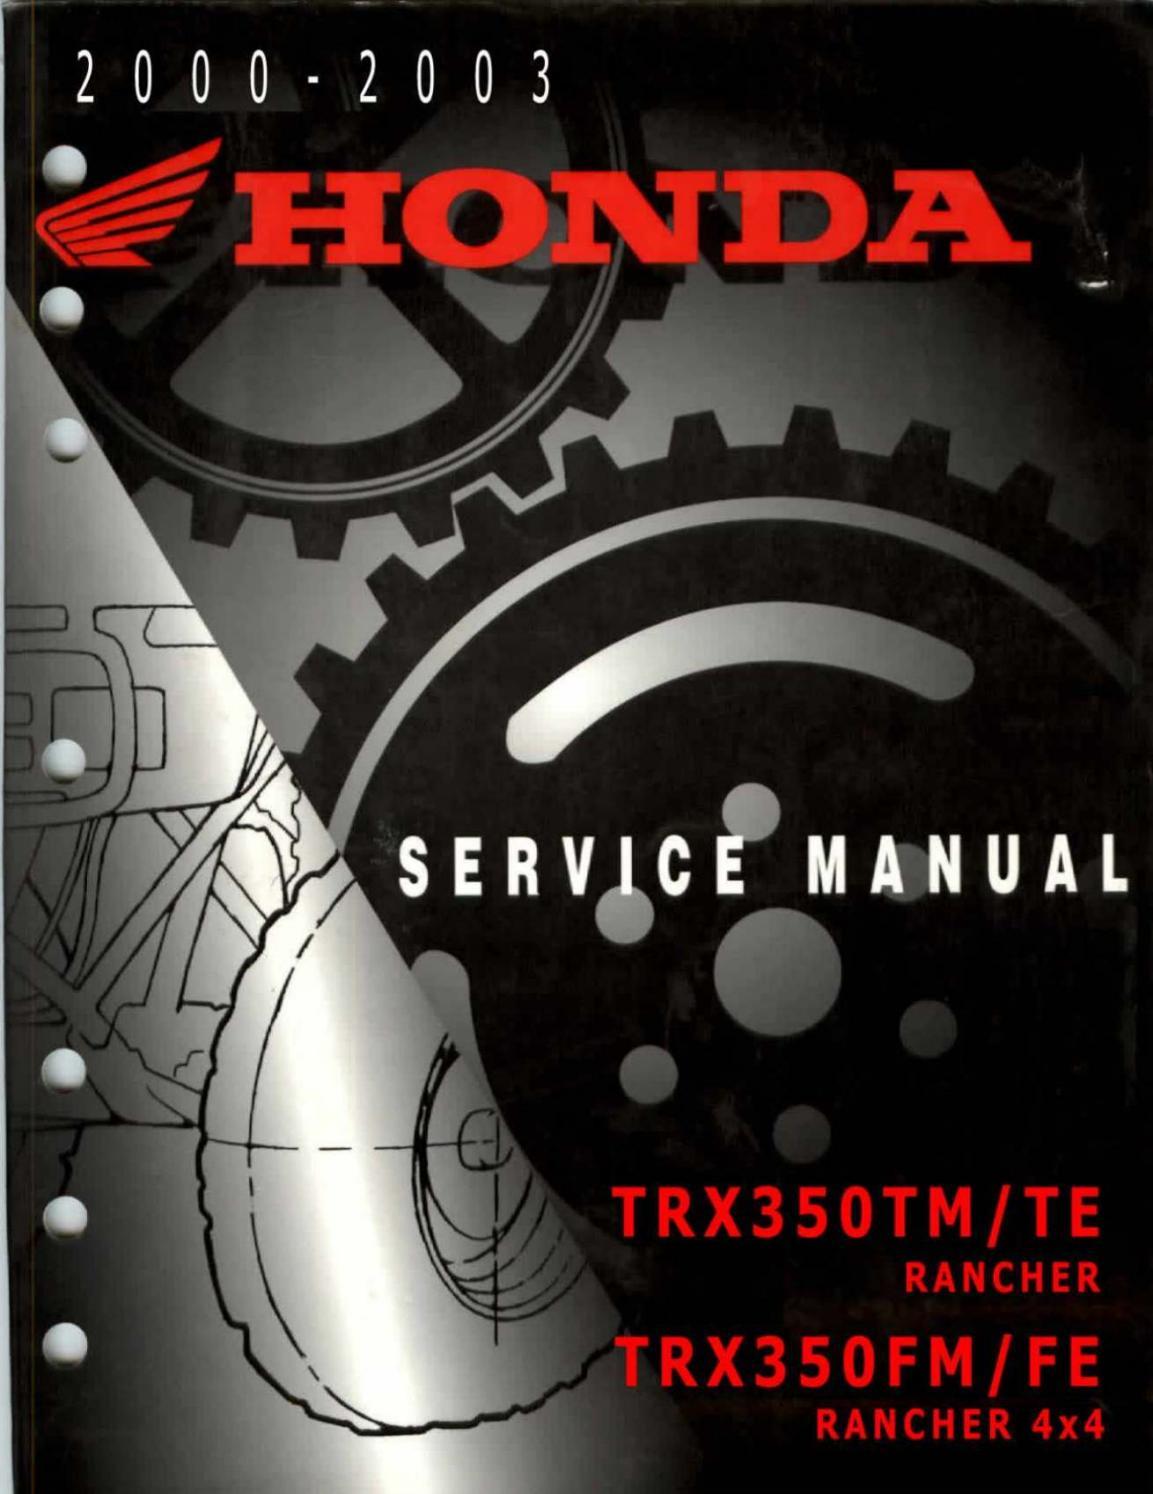 2002 Honda Trx350 Rancher 350 Service Repair Manual By 16366108 Issuu